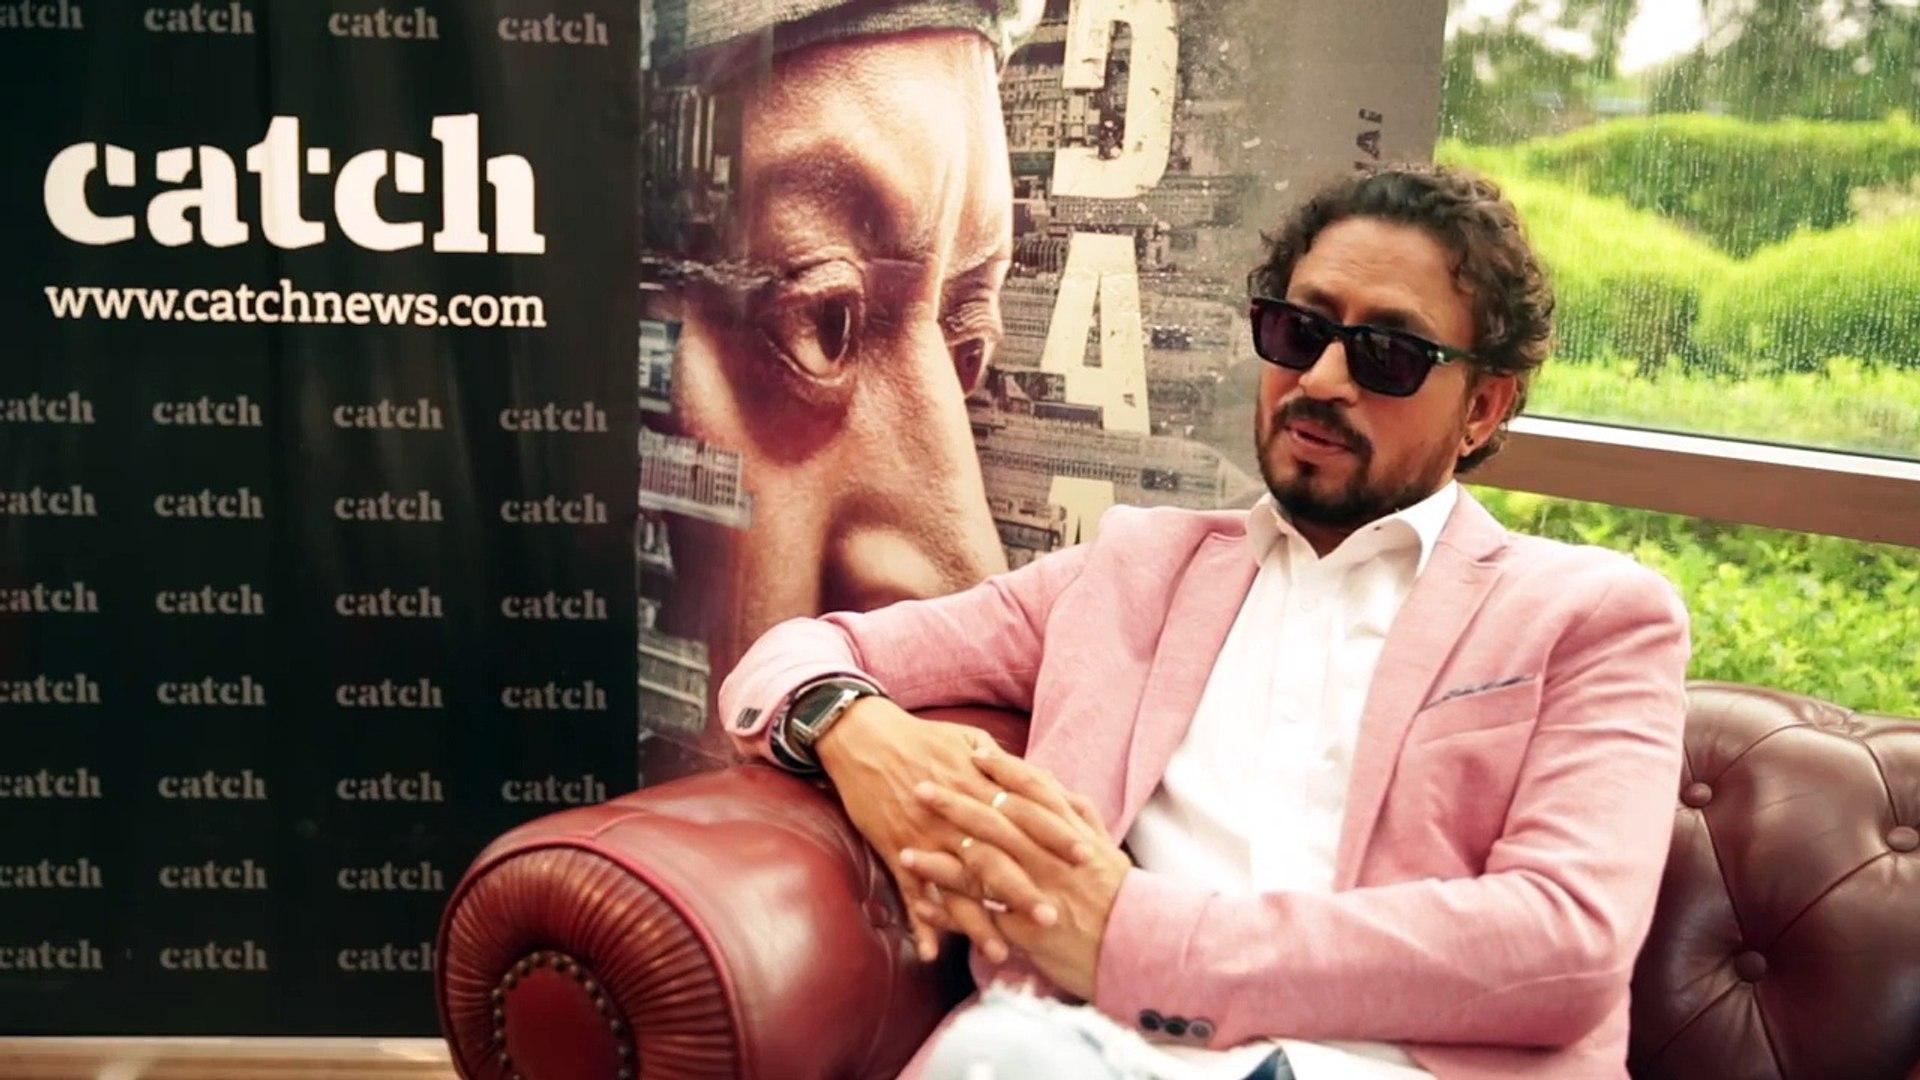 Irrfan Khan talks to catch news about his latest movie Madari